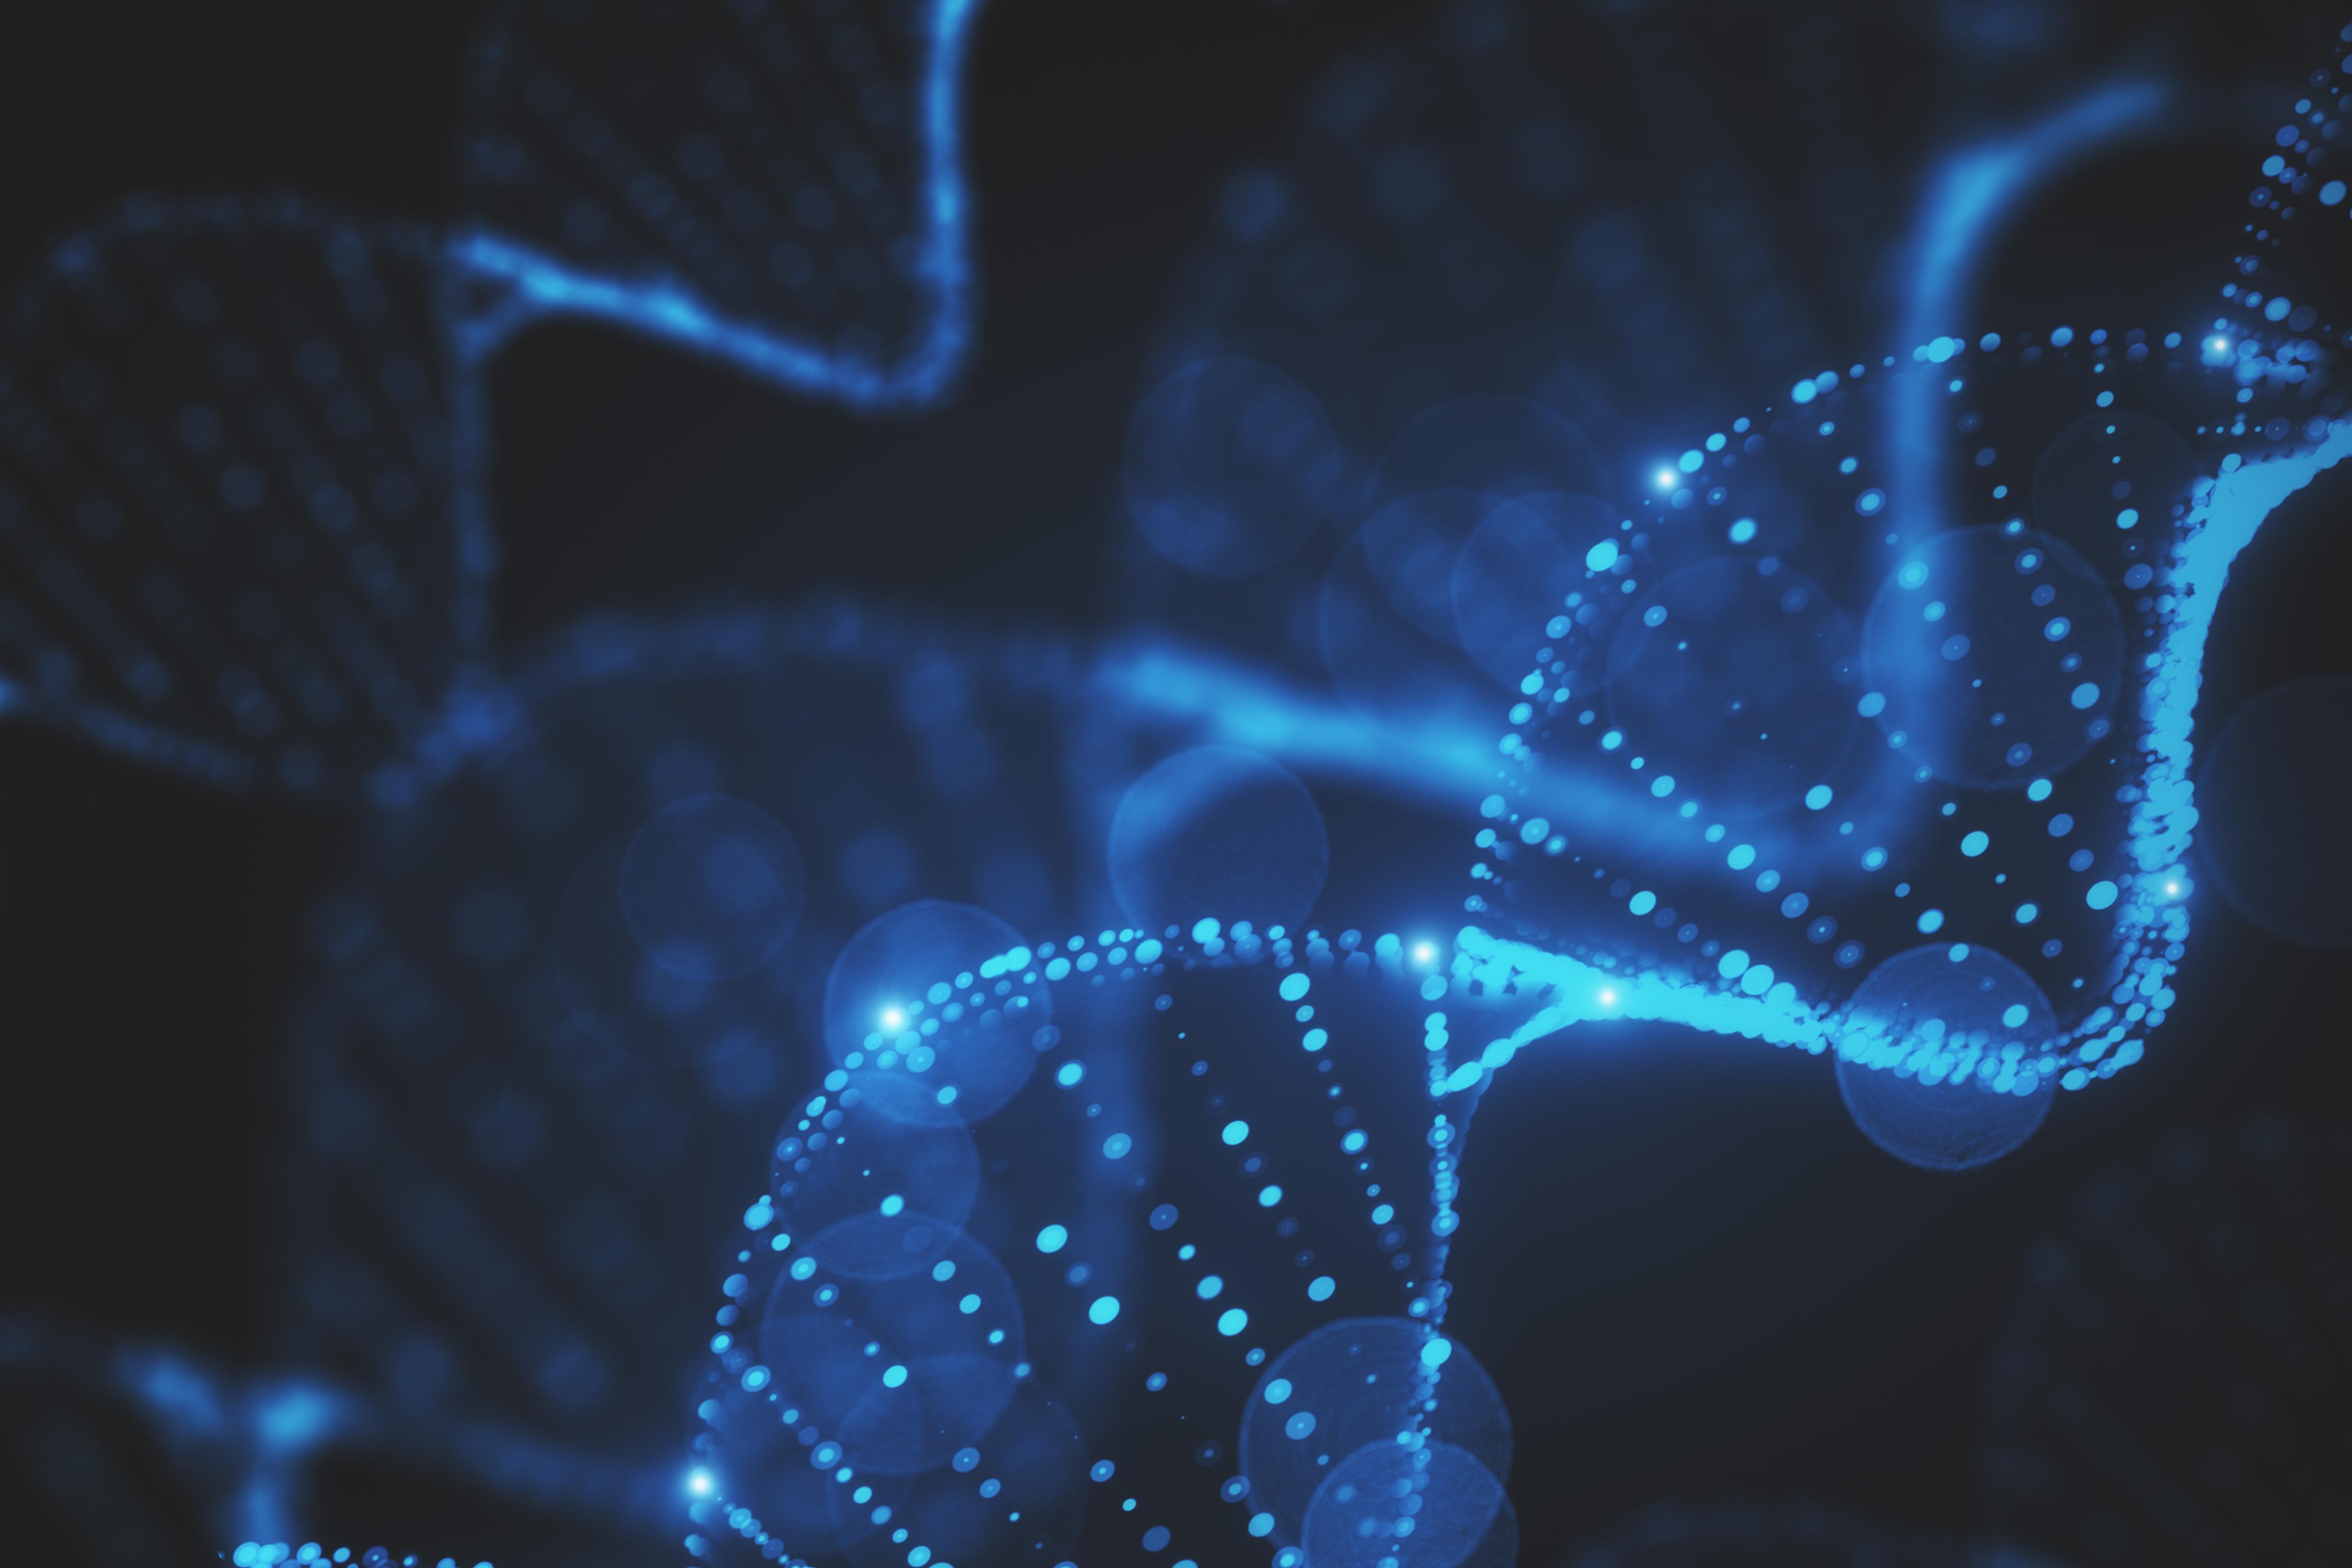 An illustration of DNA.